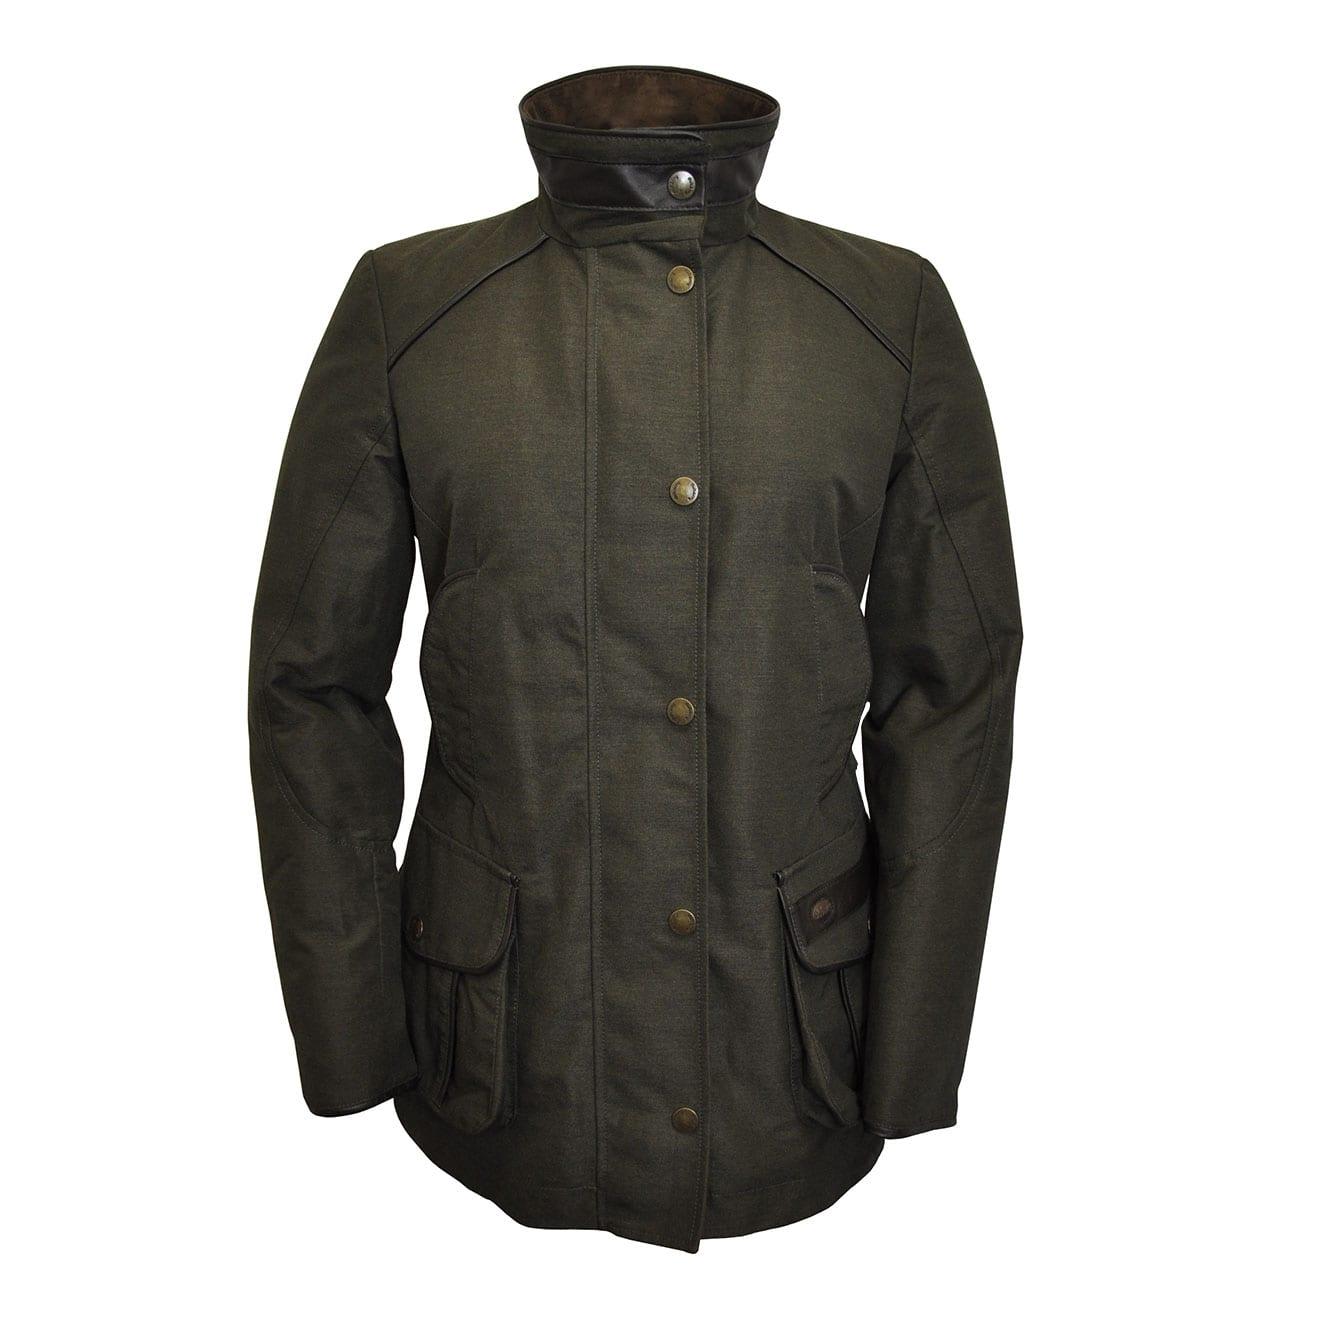 Womens gortex jackets